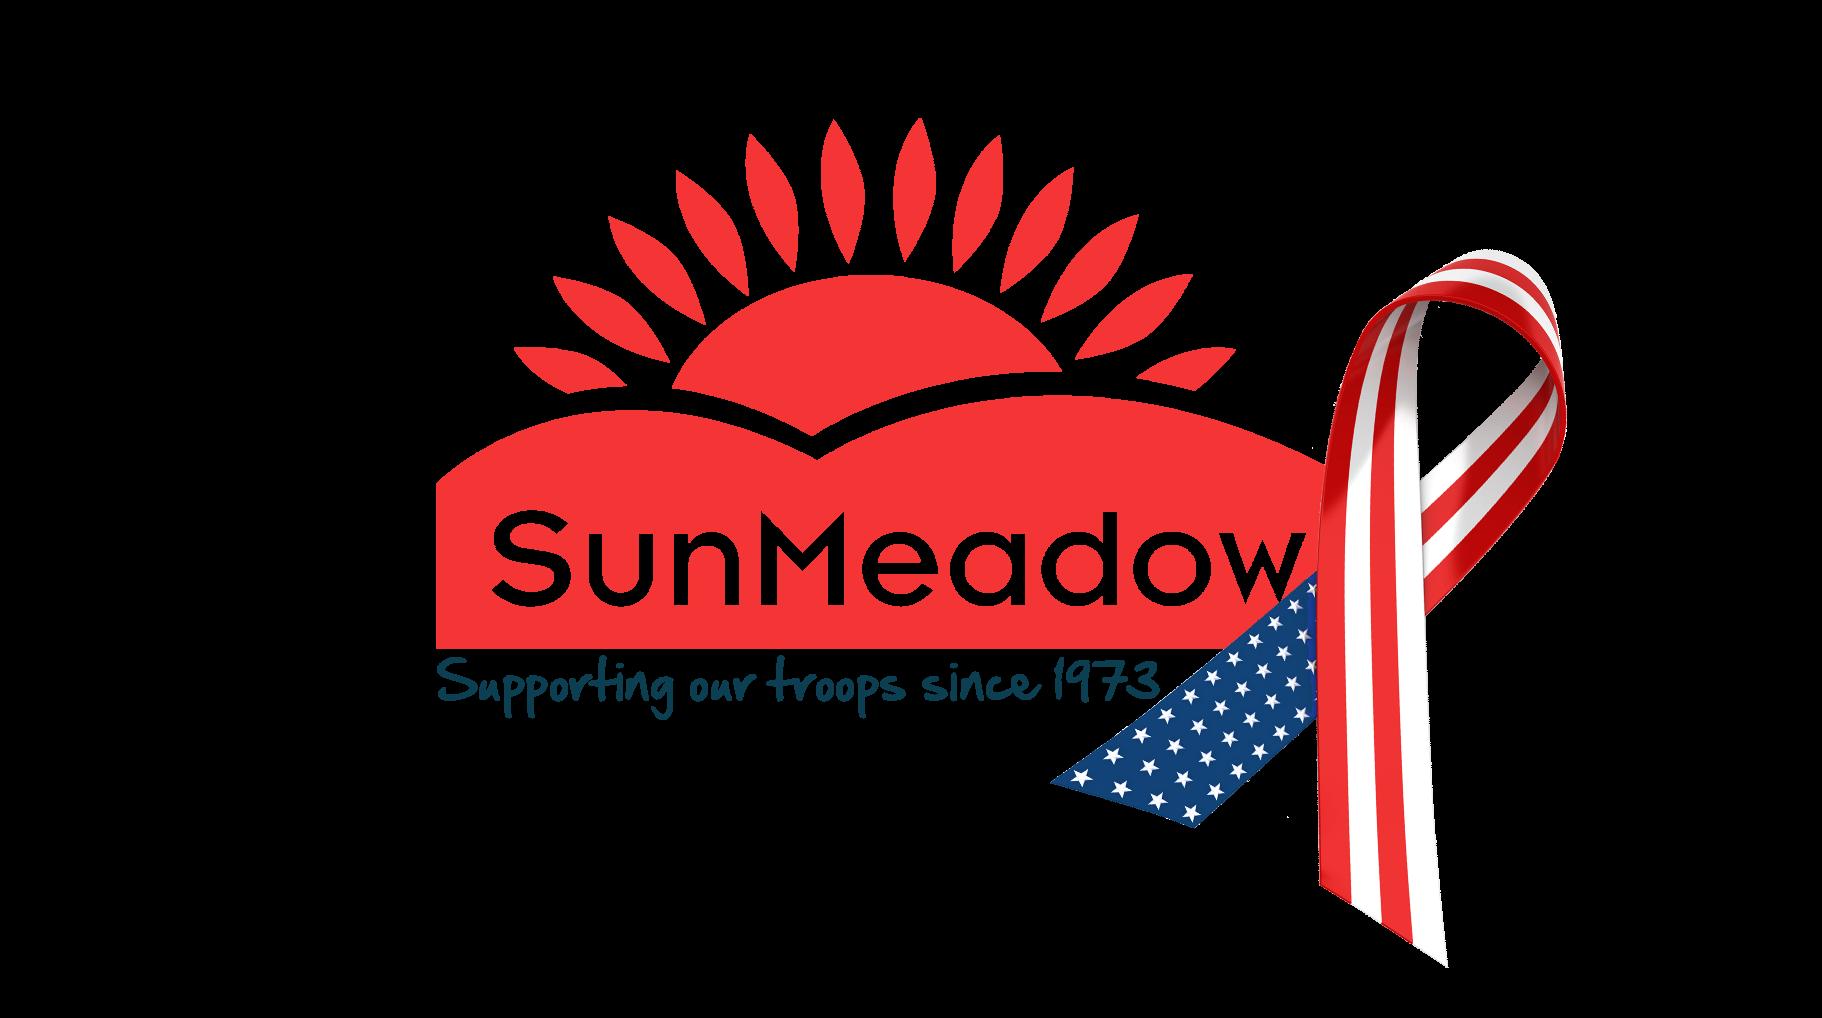 SunMeadow Military.png